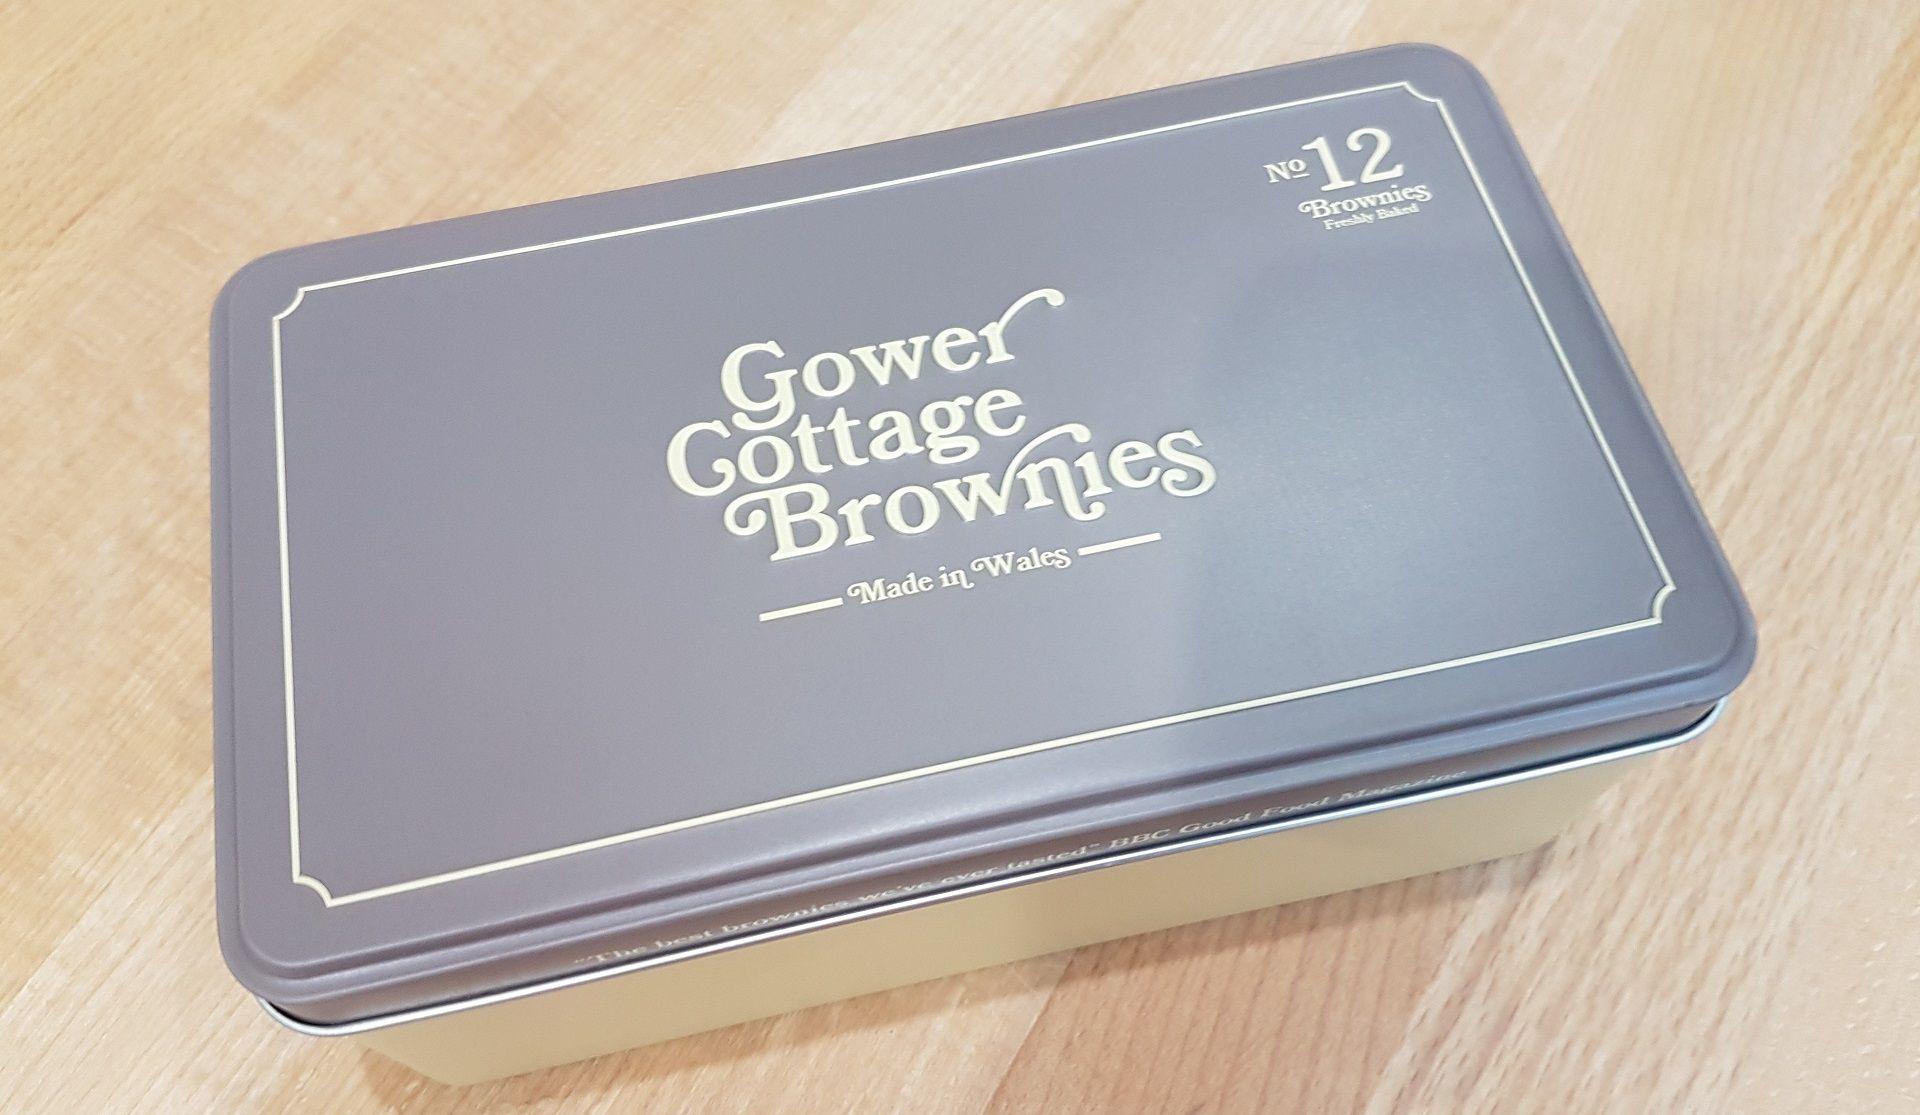 Mixed Blondie/Brownie in a presentation tin